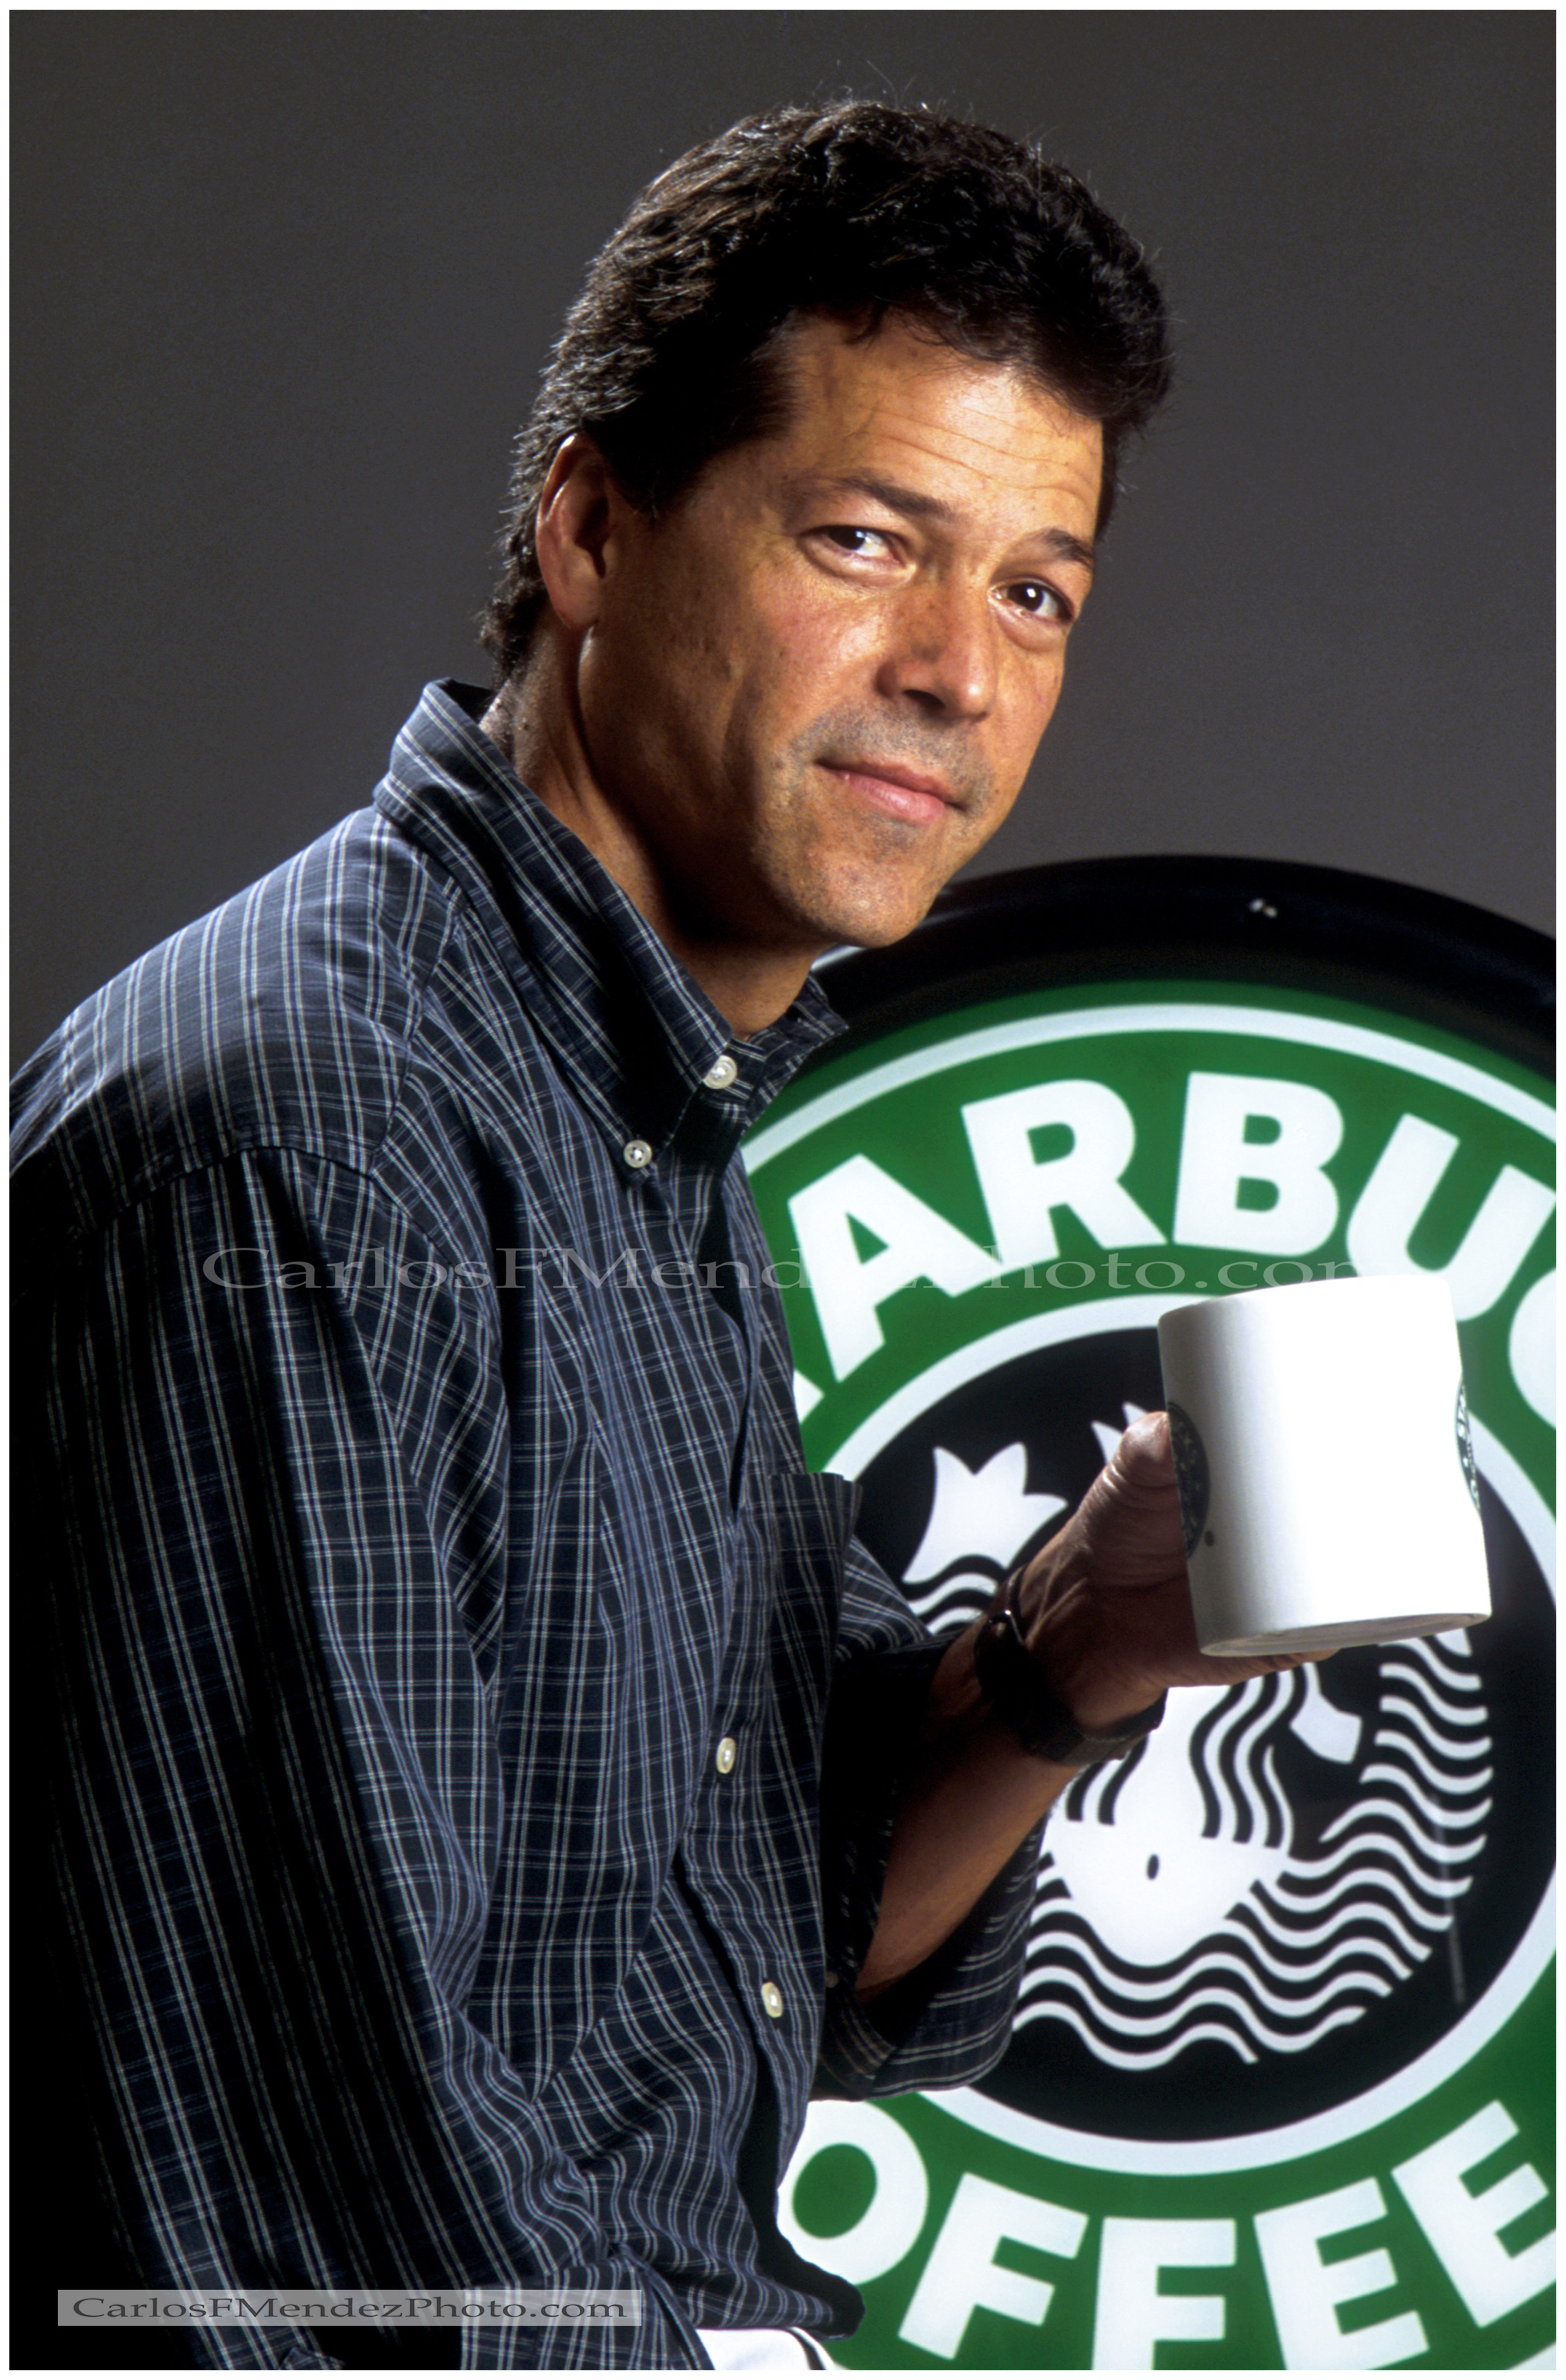 StarbucksWL